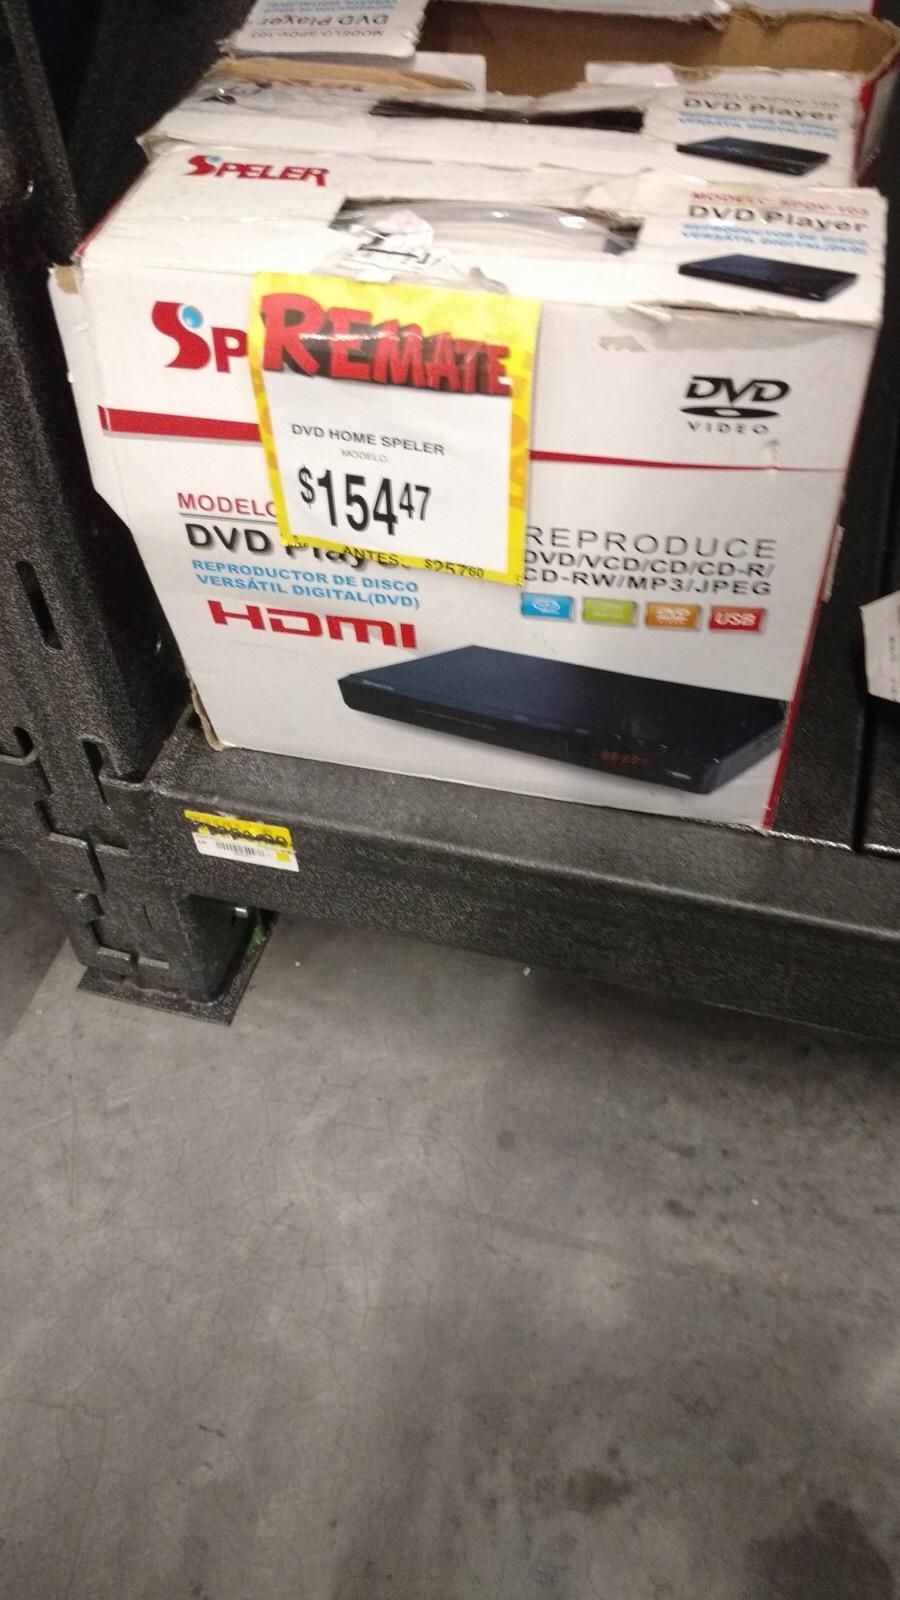 Bodega Aurrerá: reproductor DVD Speler a $154